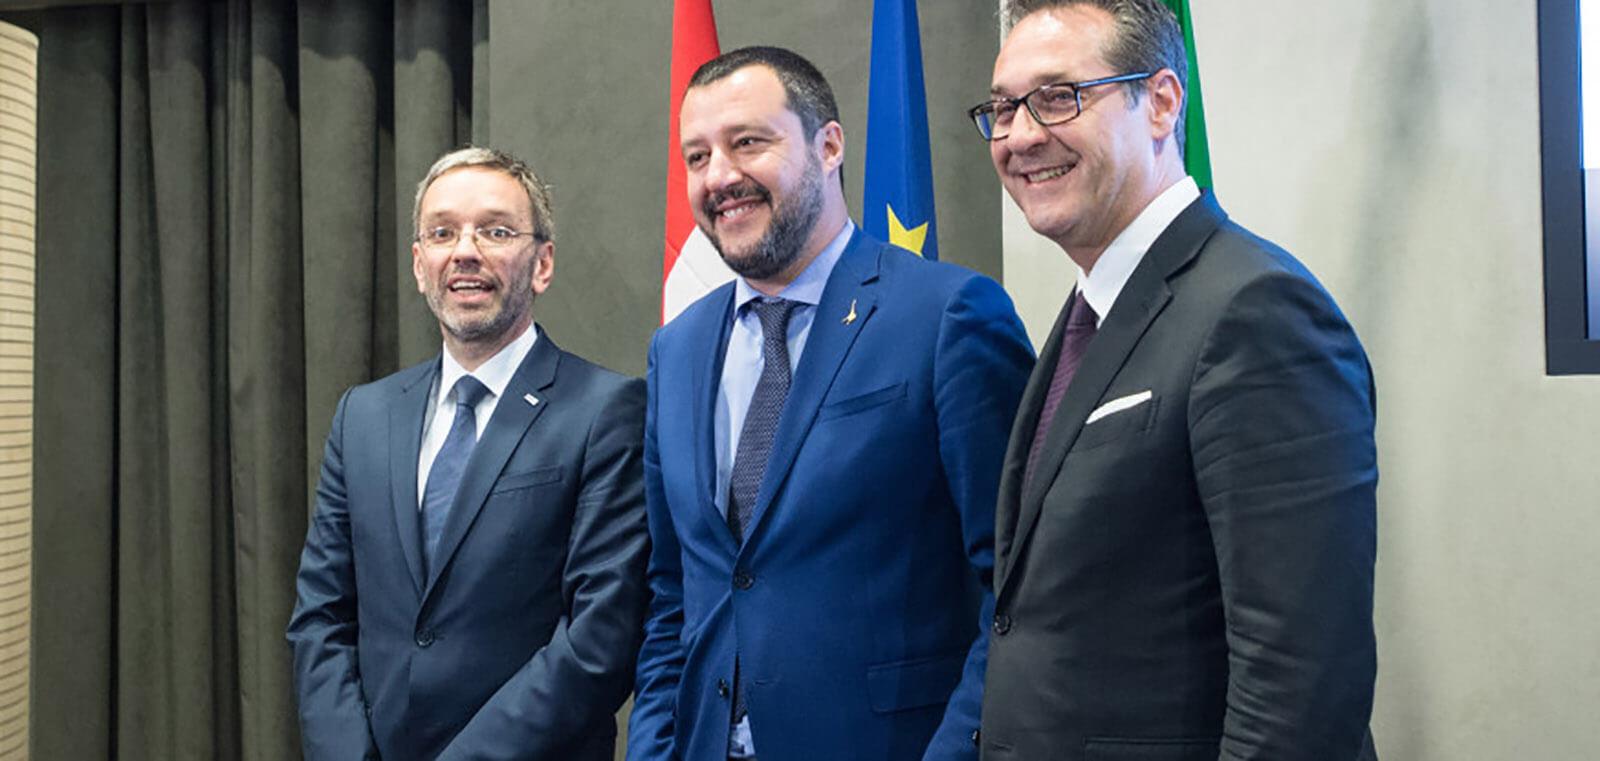 Matteo Salvini, Heinz Christian Strache und Herbert Kickl